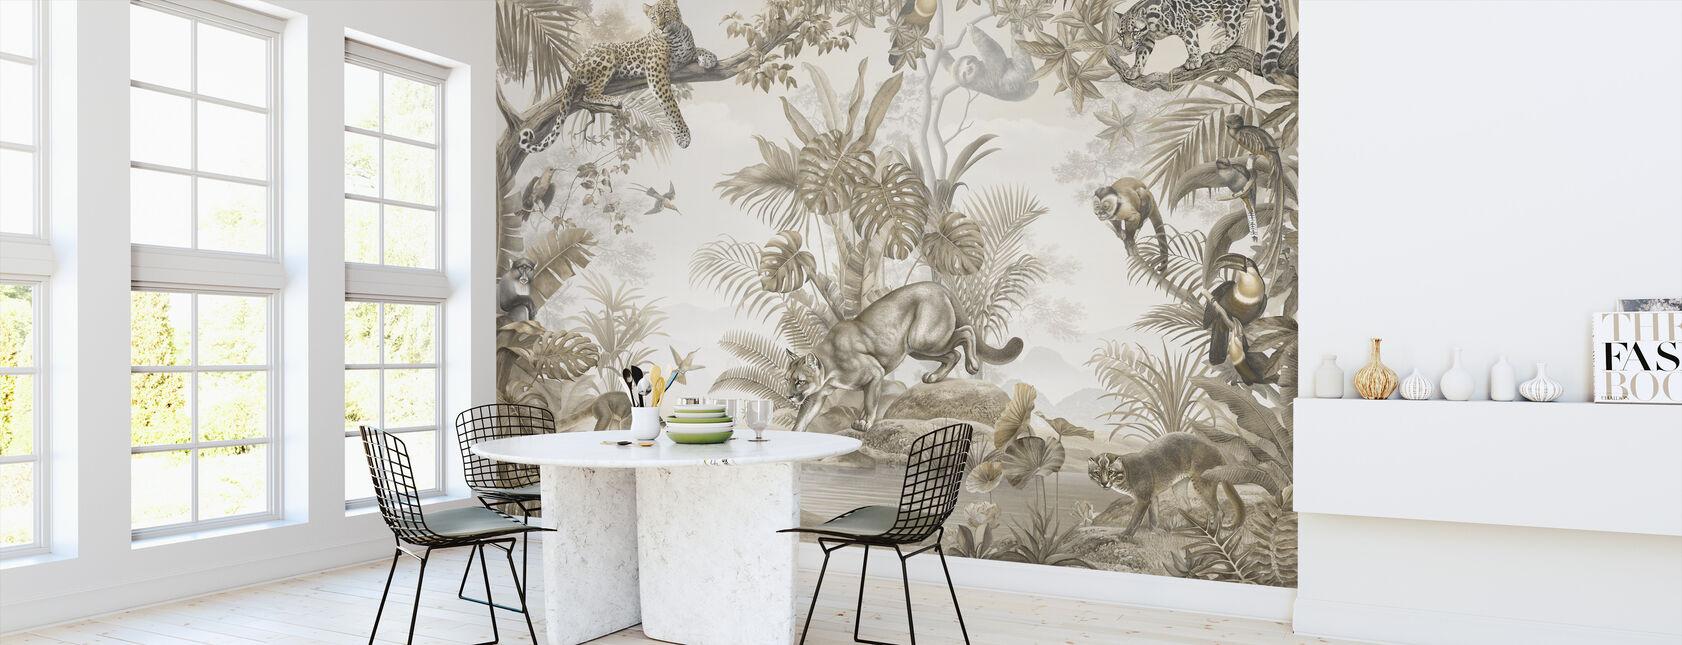 Jungle Hangout - Sepia - Tapet - Køkken